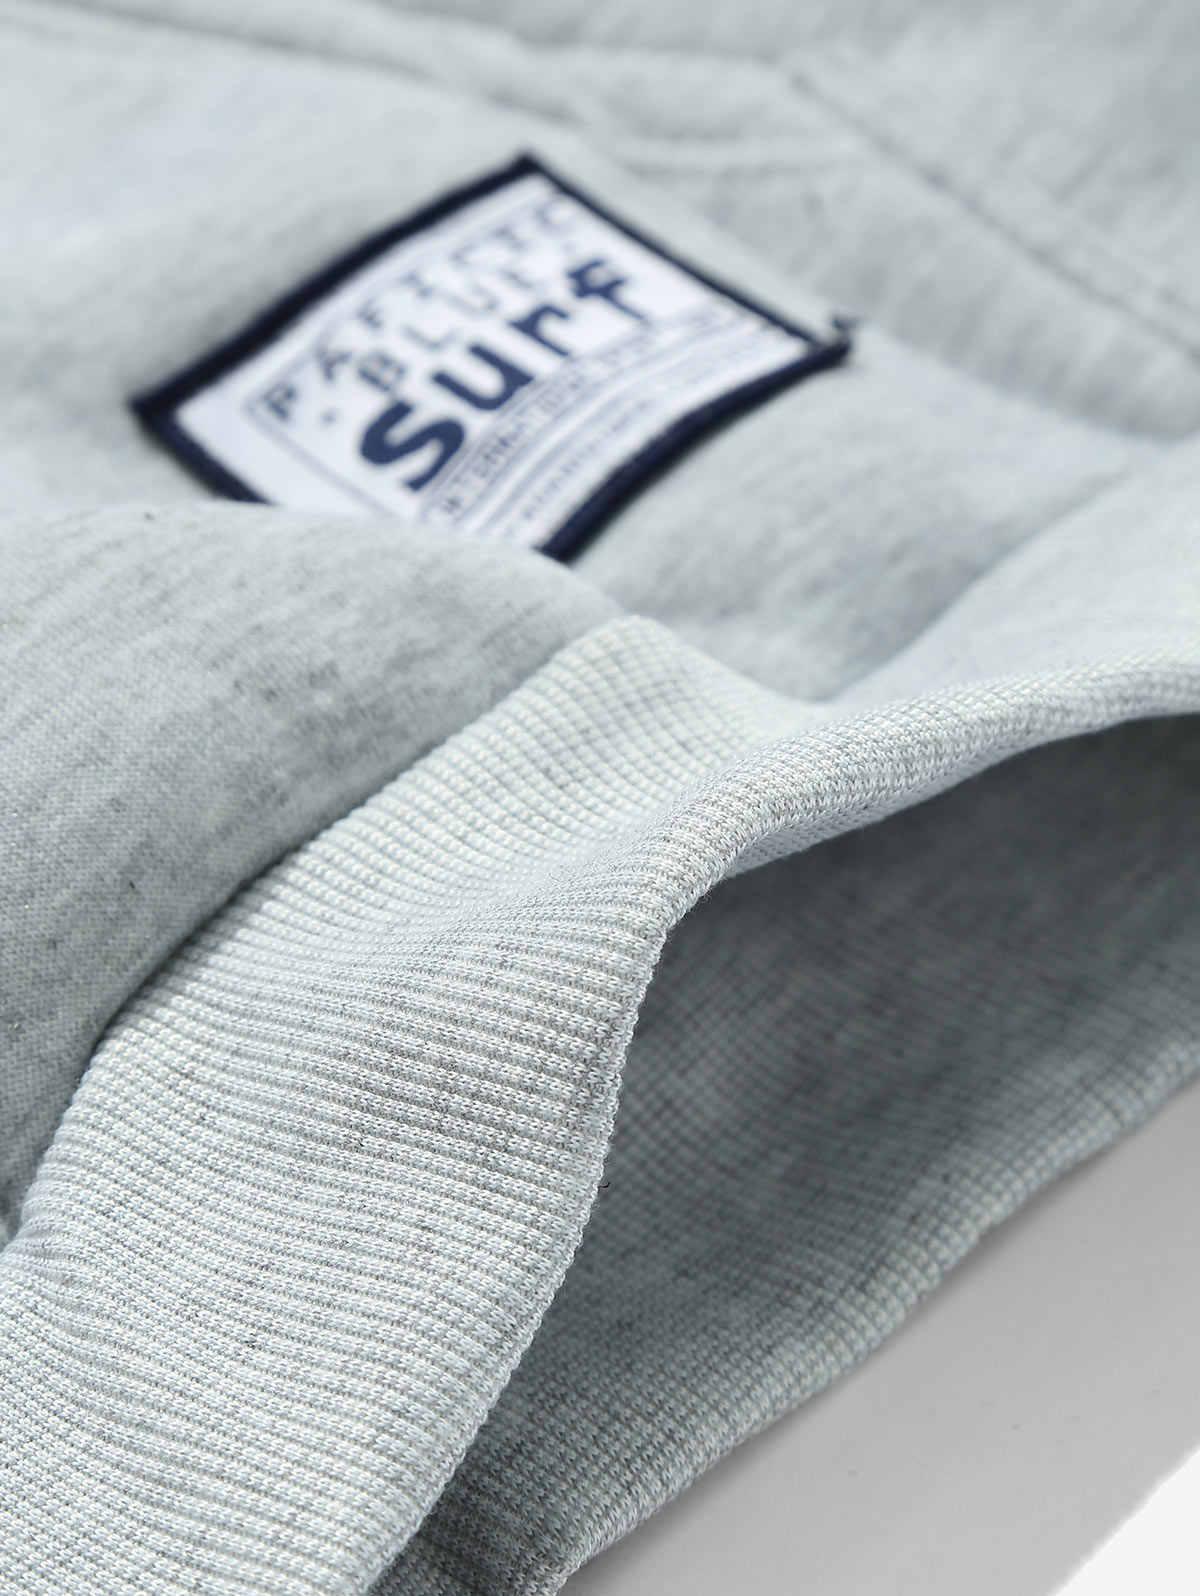 ZAFUL 솔리드 컬러 파우치 포켓 플리스 까마귀 기본 후드 티셔츠 탑 심플 스타일 스웨터 가을 따뜻한 남성 소프트 후드